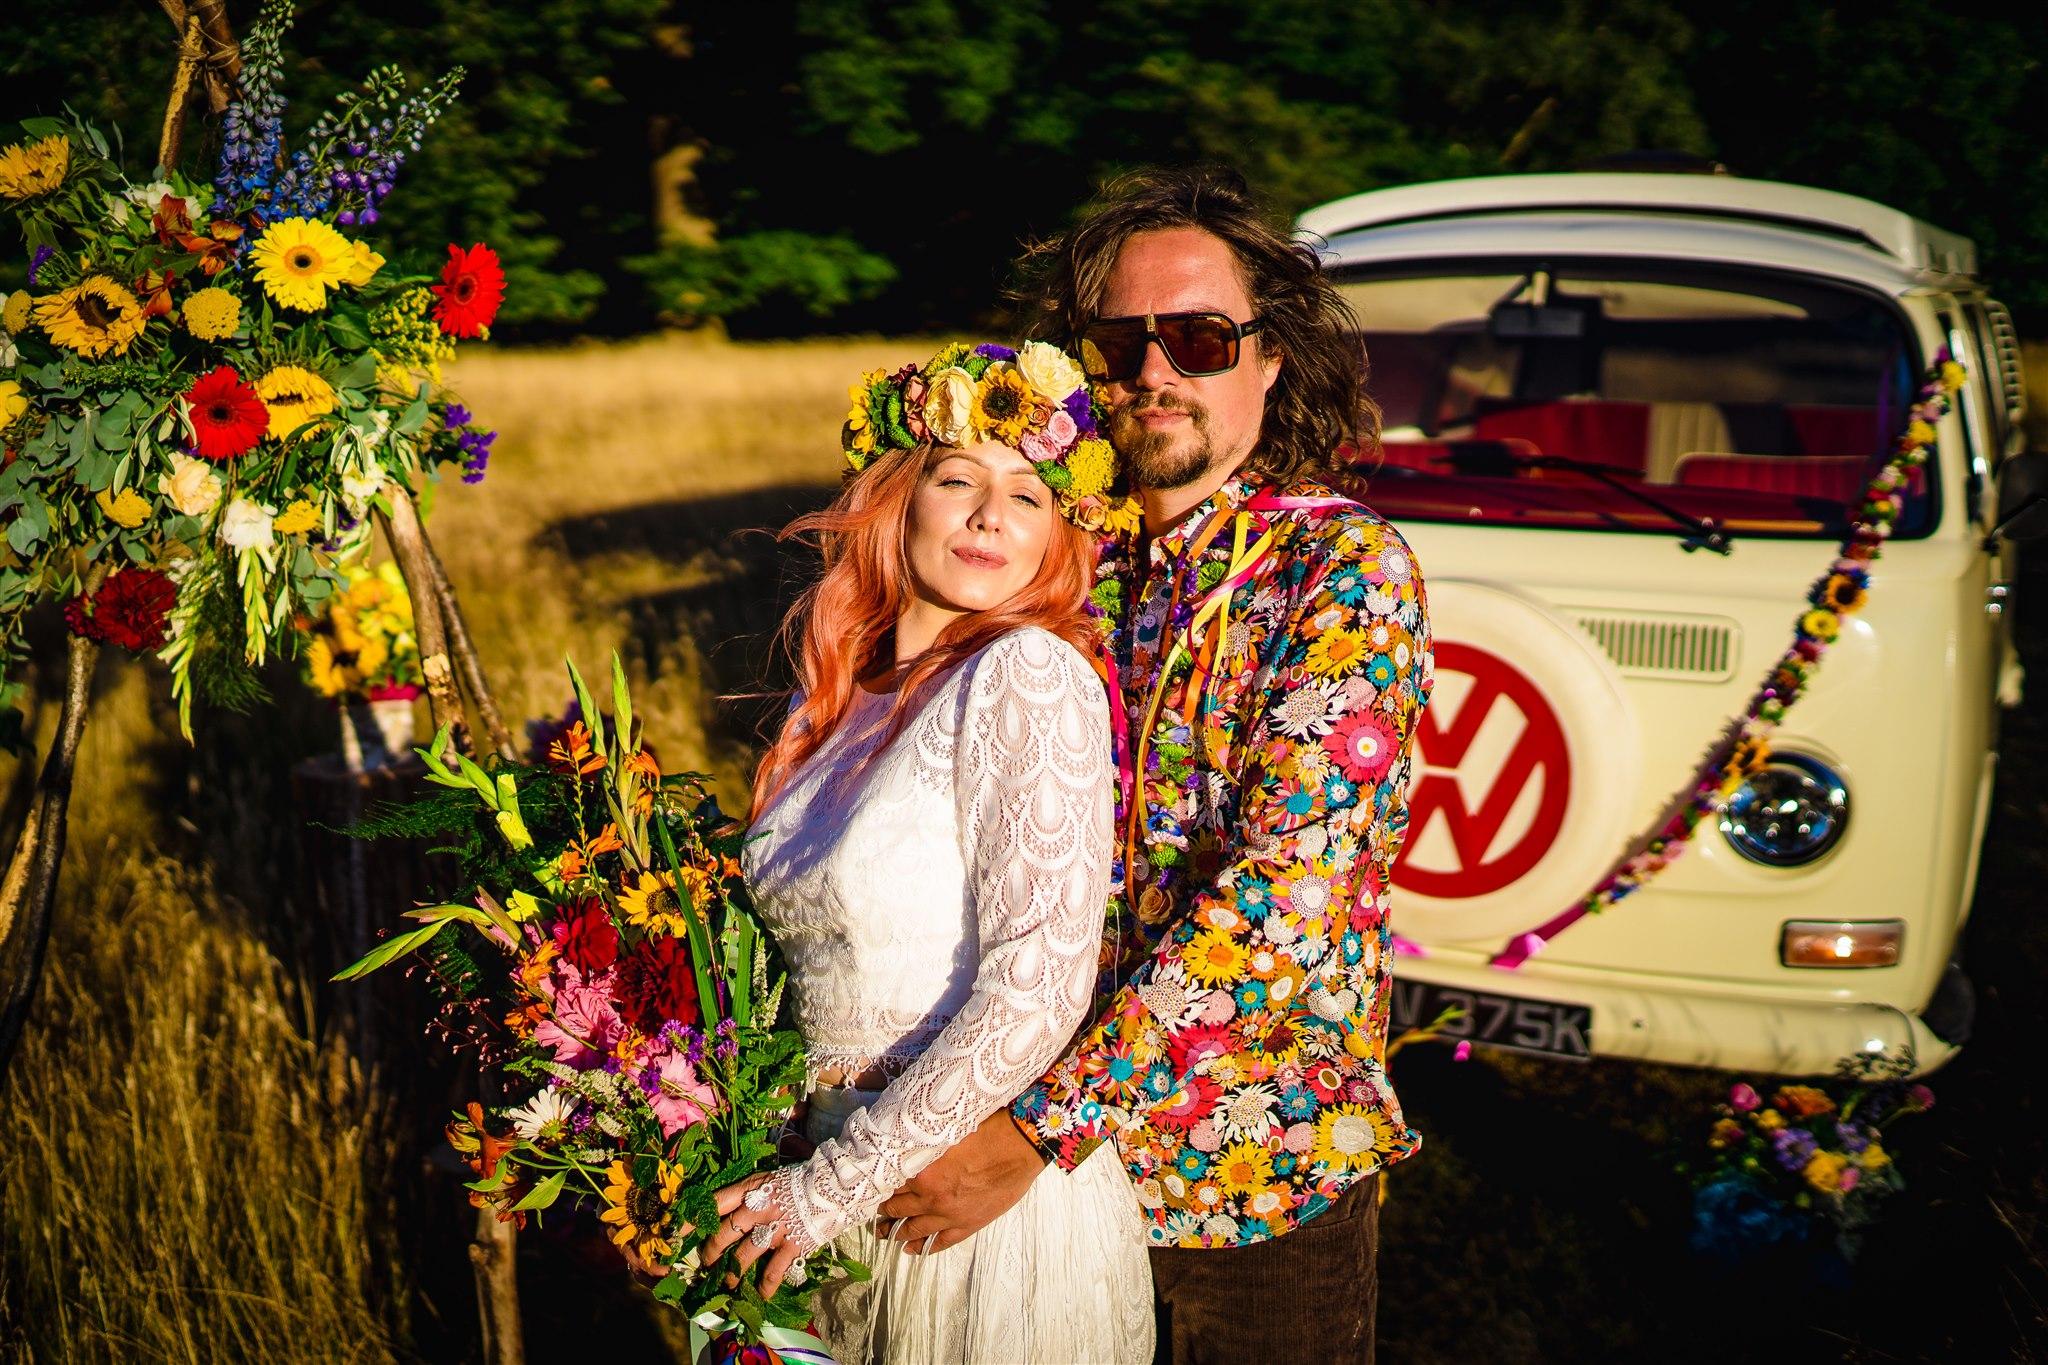 colourful bohemian wedding - 70s wedding - campervan wedding - hippie wedding - colourful wedding flowers